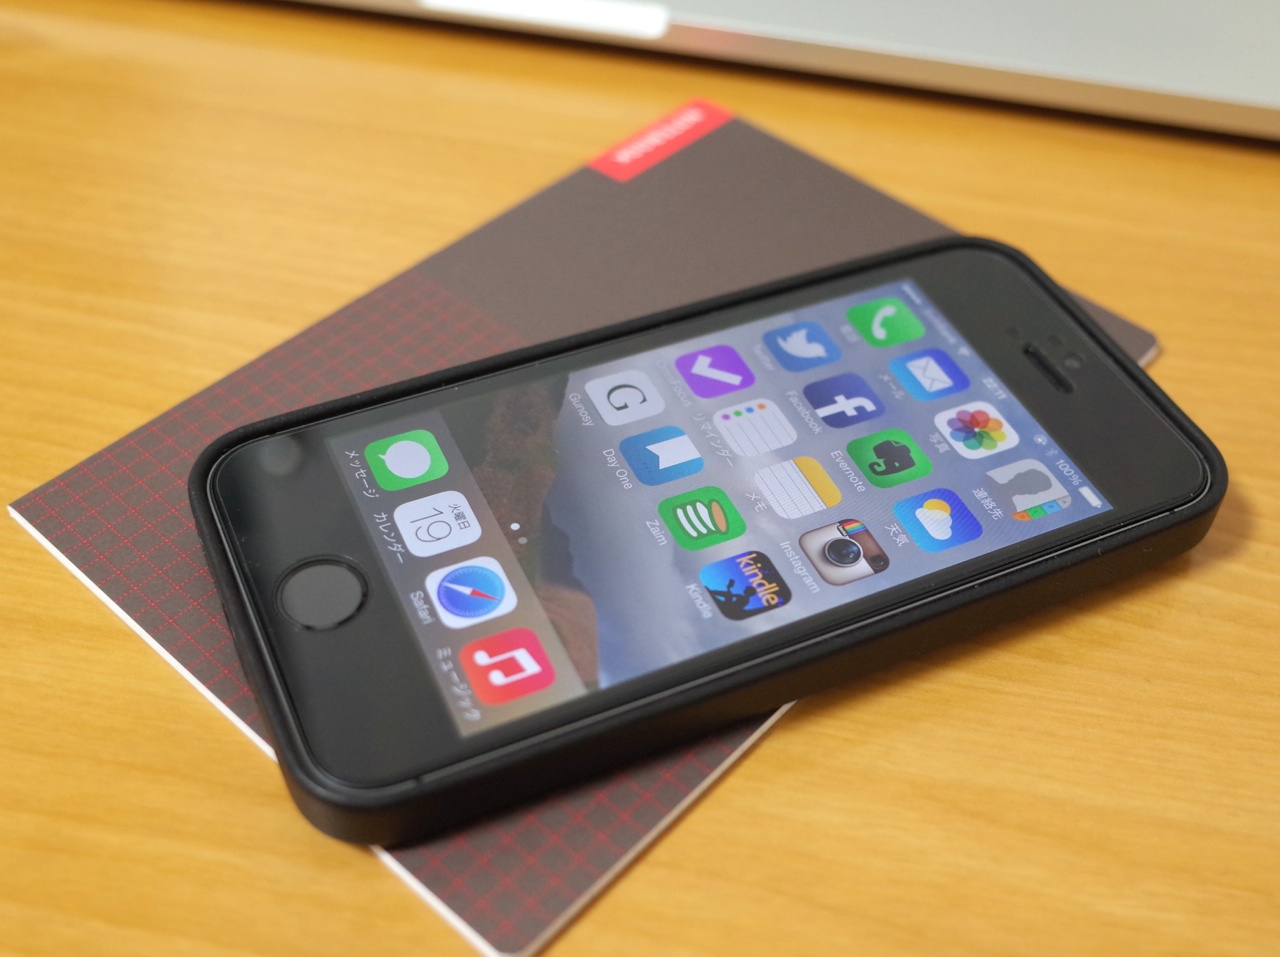 iPhoneとほぼ日のメモ帳の写真